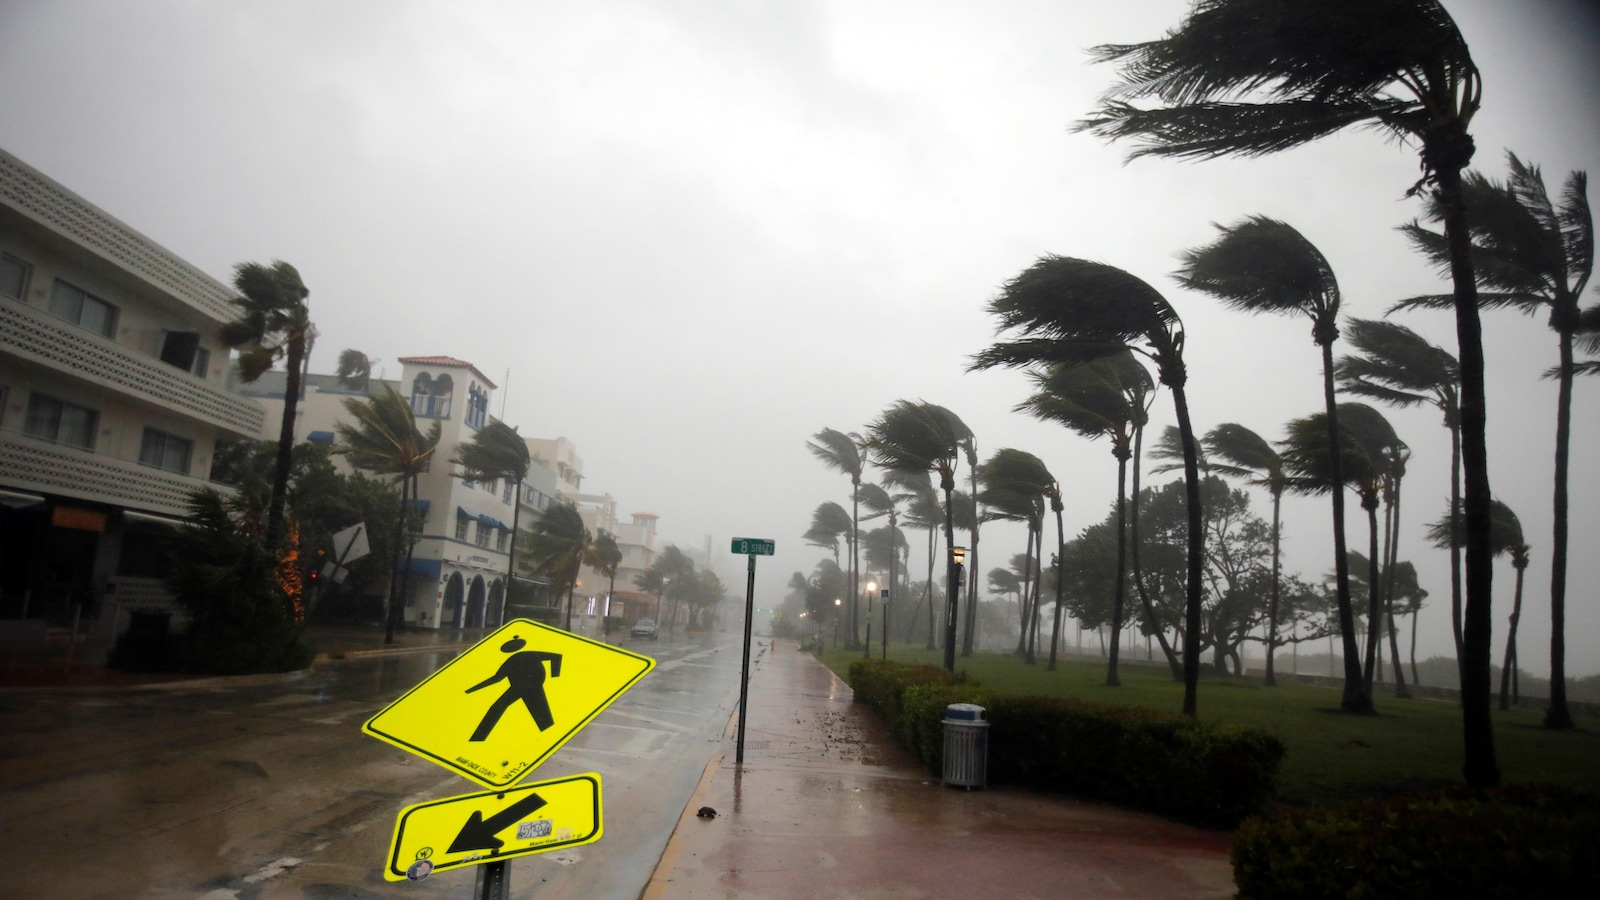 Macron se rendra mardi matin sur l'île de Saint-Martin — Irma